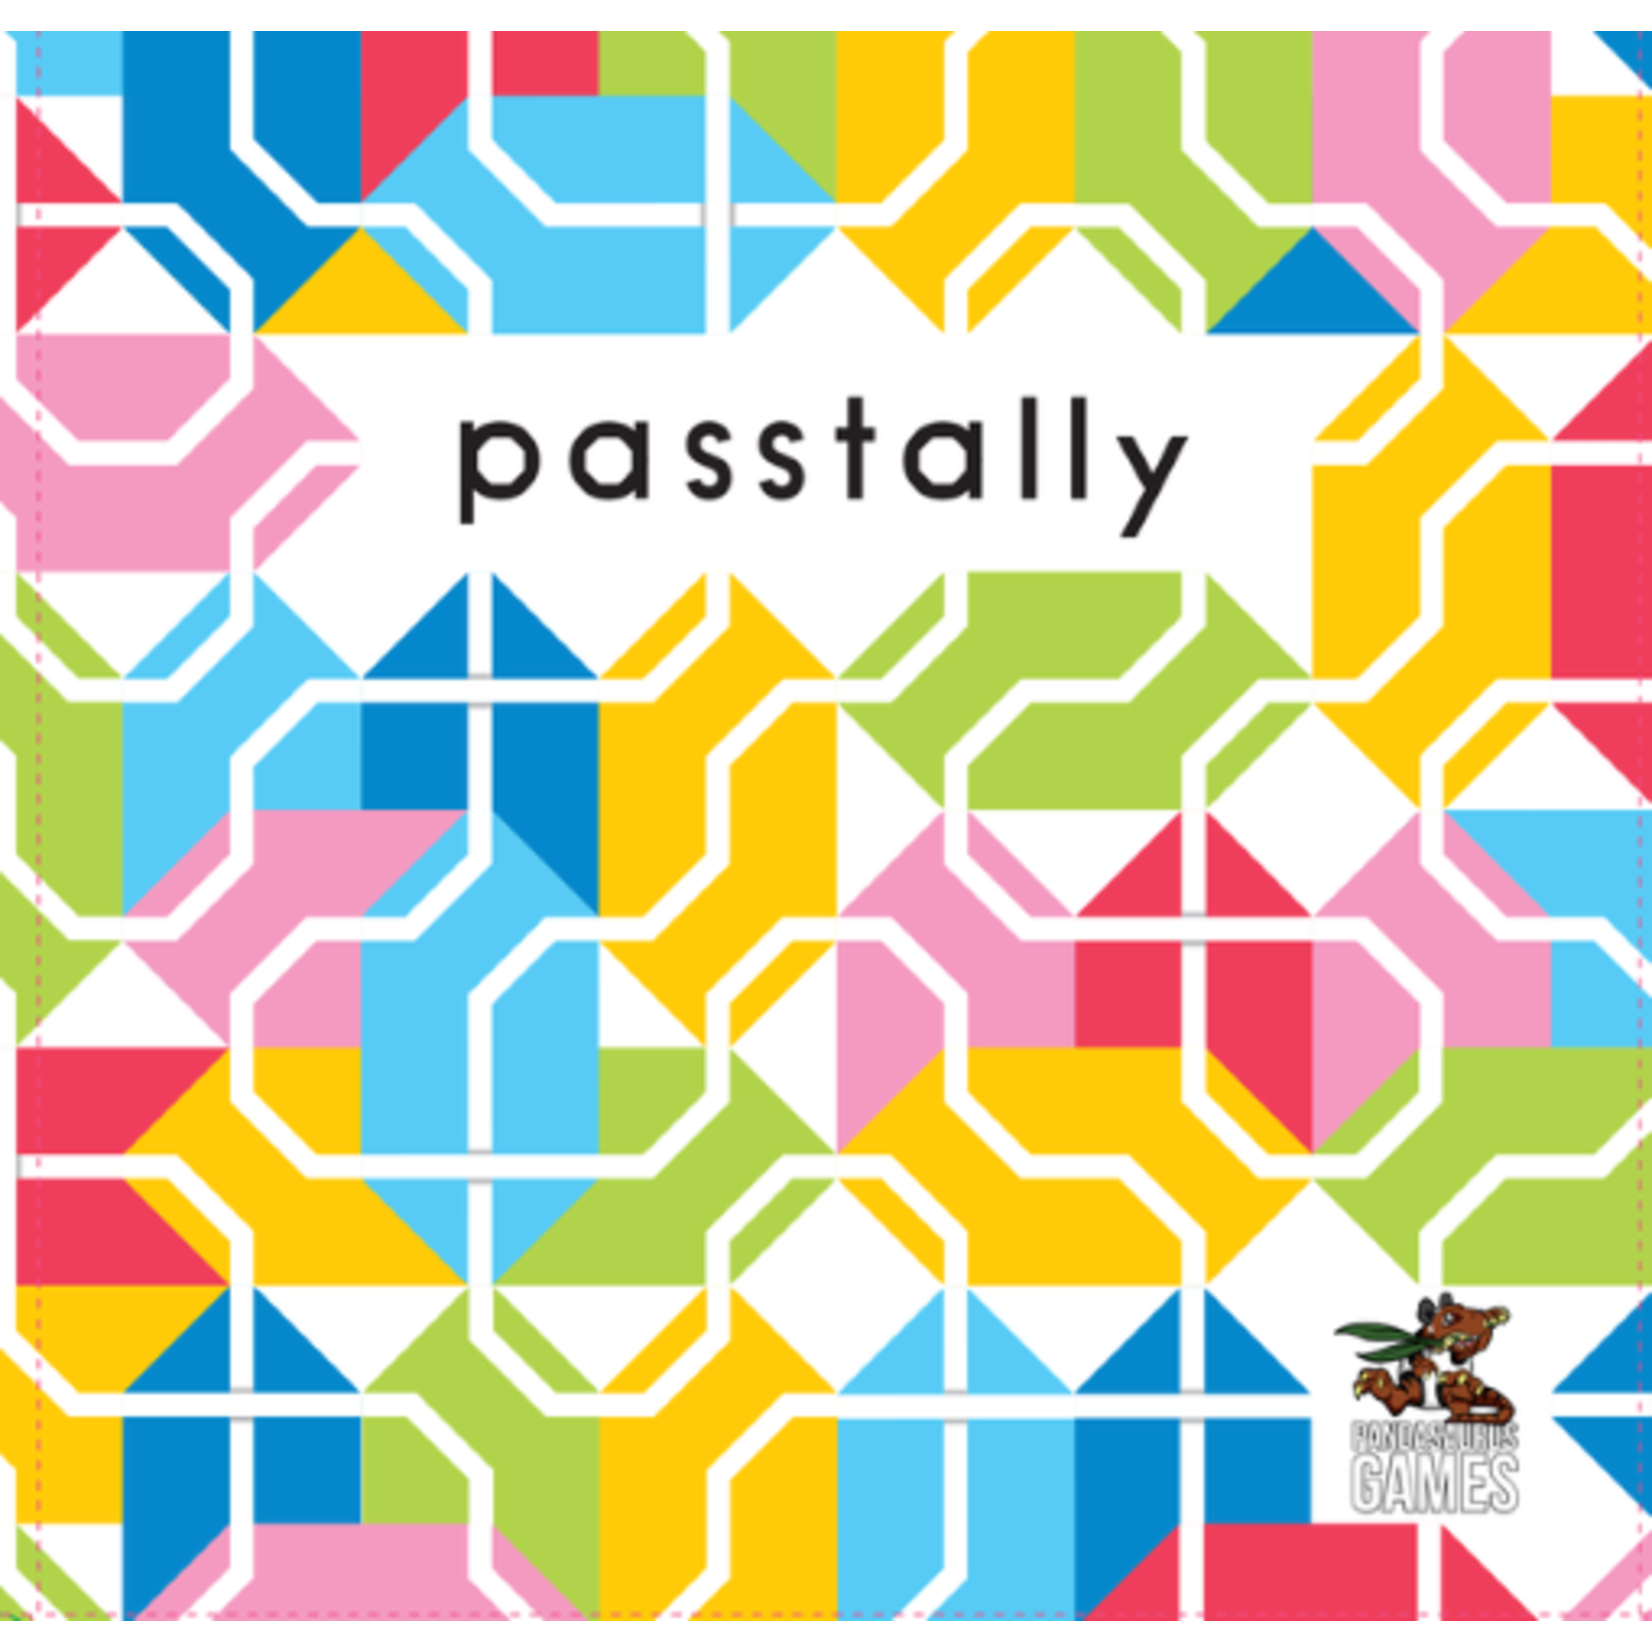 Pandasaurus Games Passtally